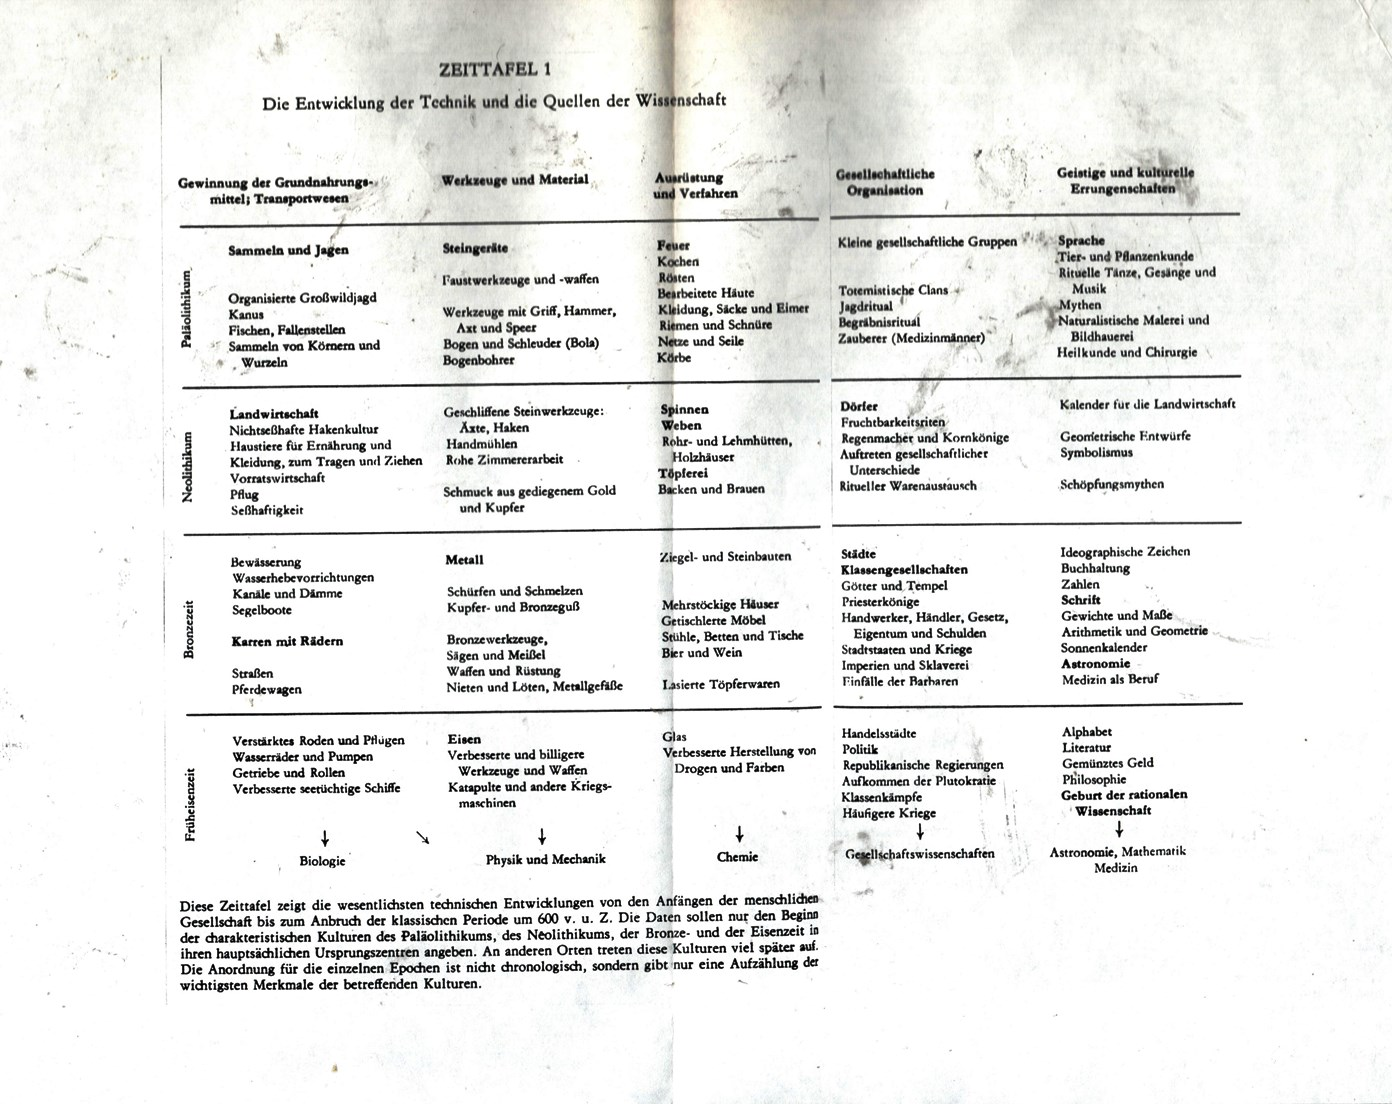 Ulm_KGU_1982_Vorbereitungsmaterial_044